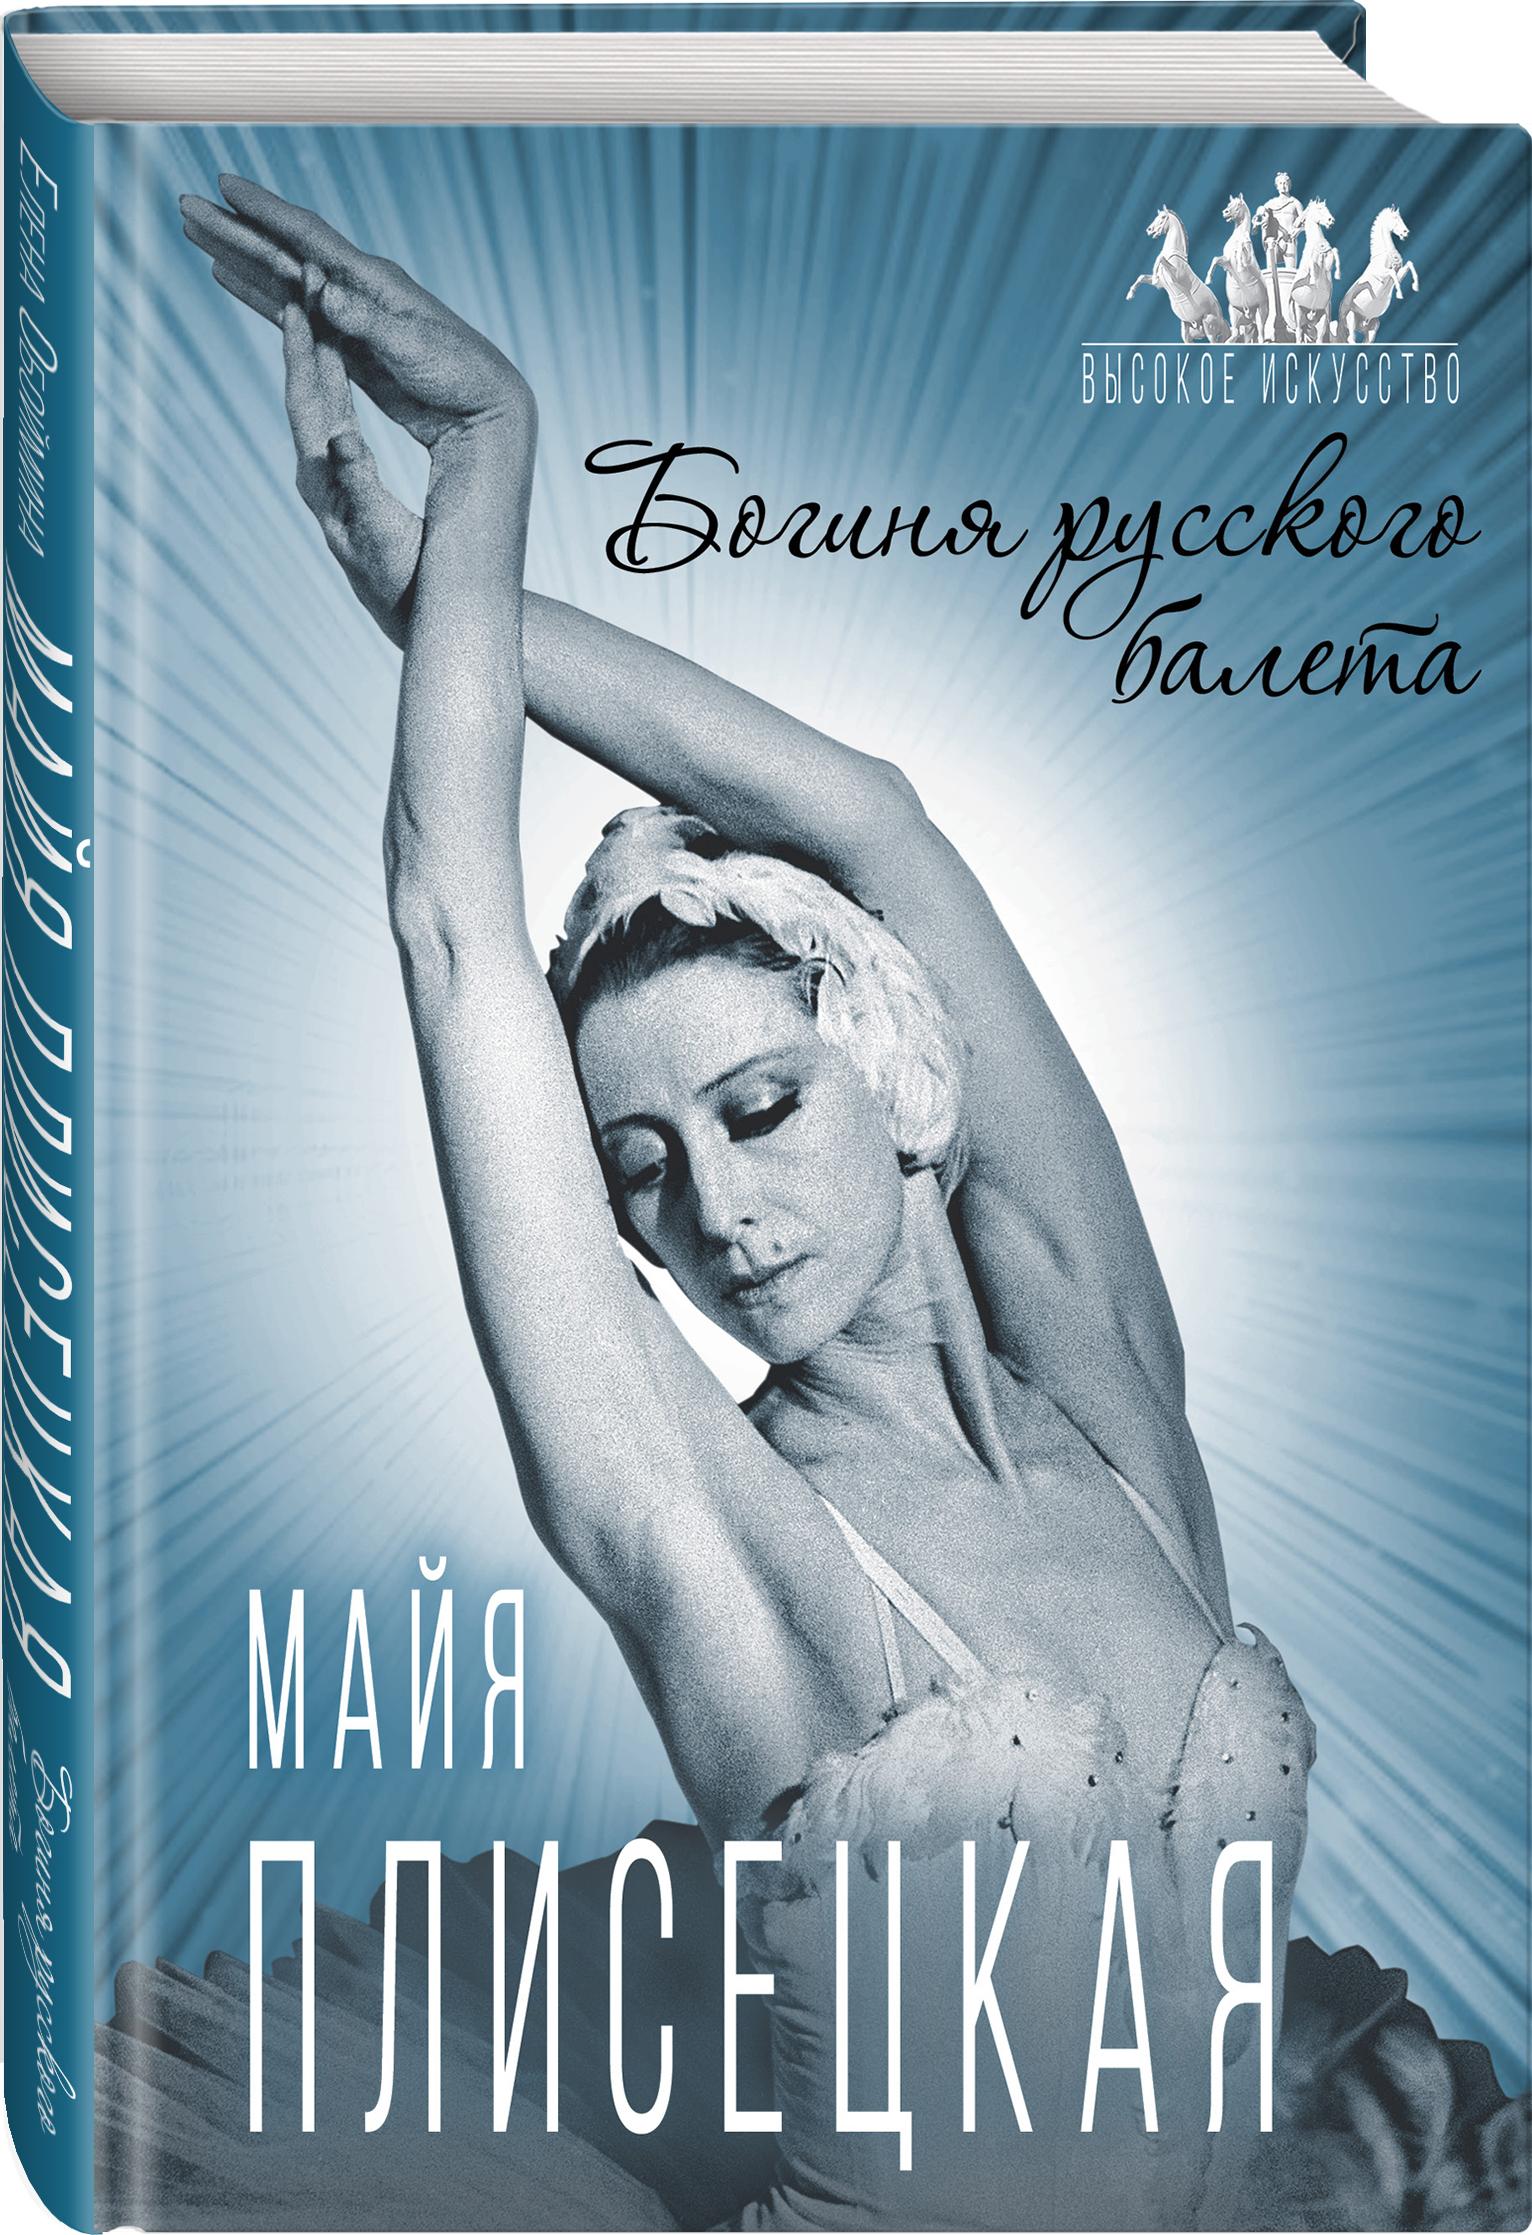 Елена Обоймина Майя Плисецкая. Богиня русского балета елена обоймина майя плисецкая богиня русского балета